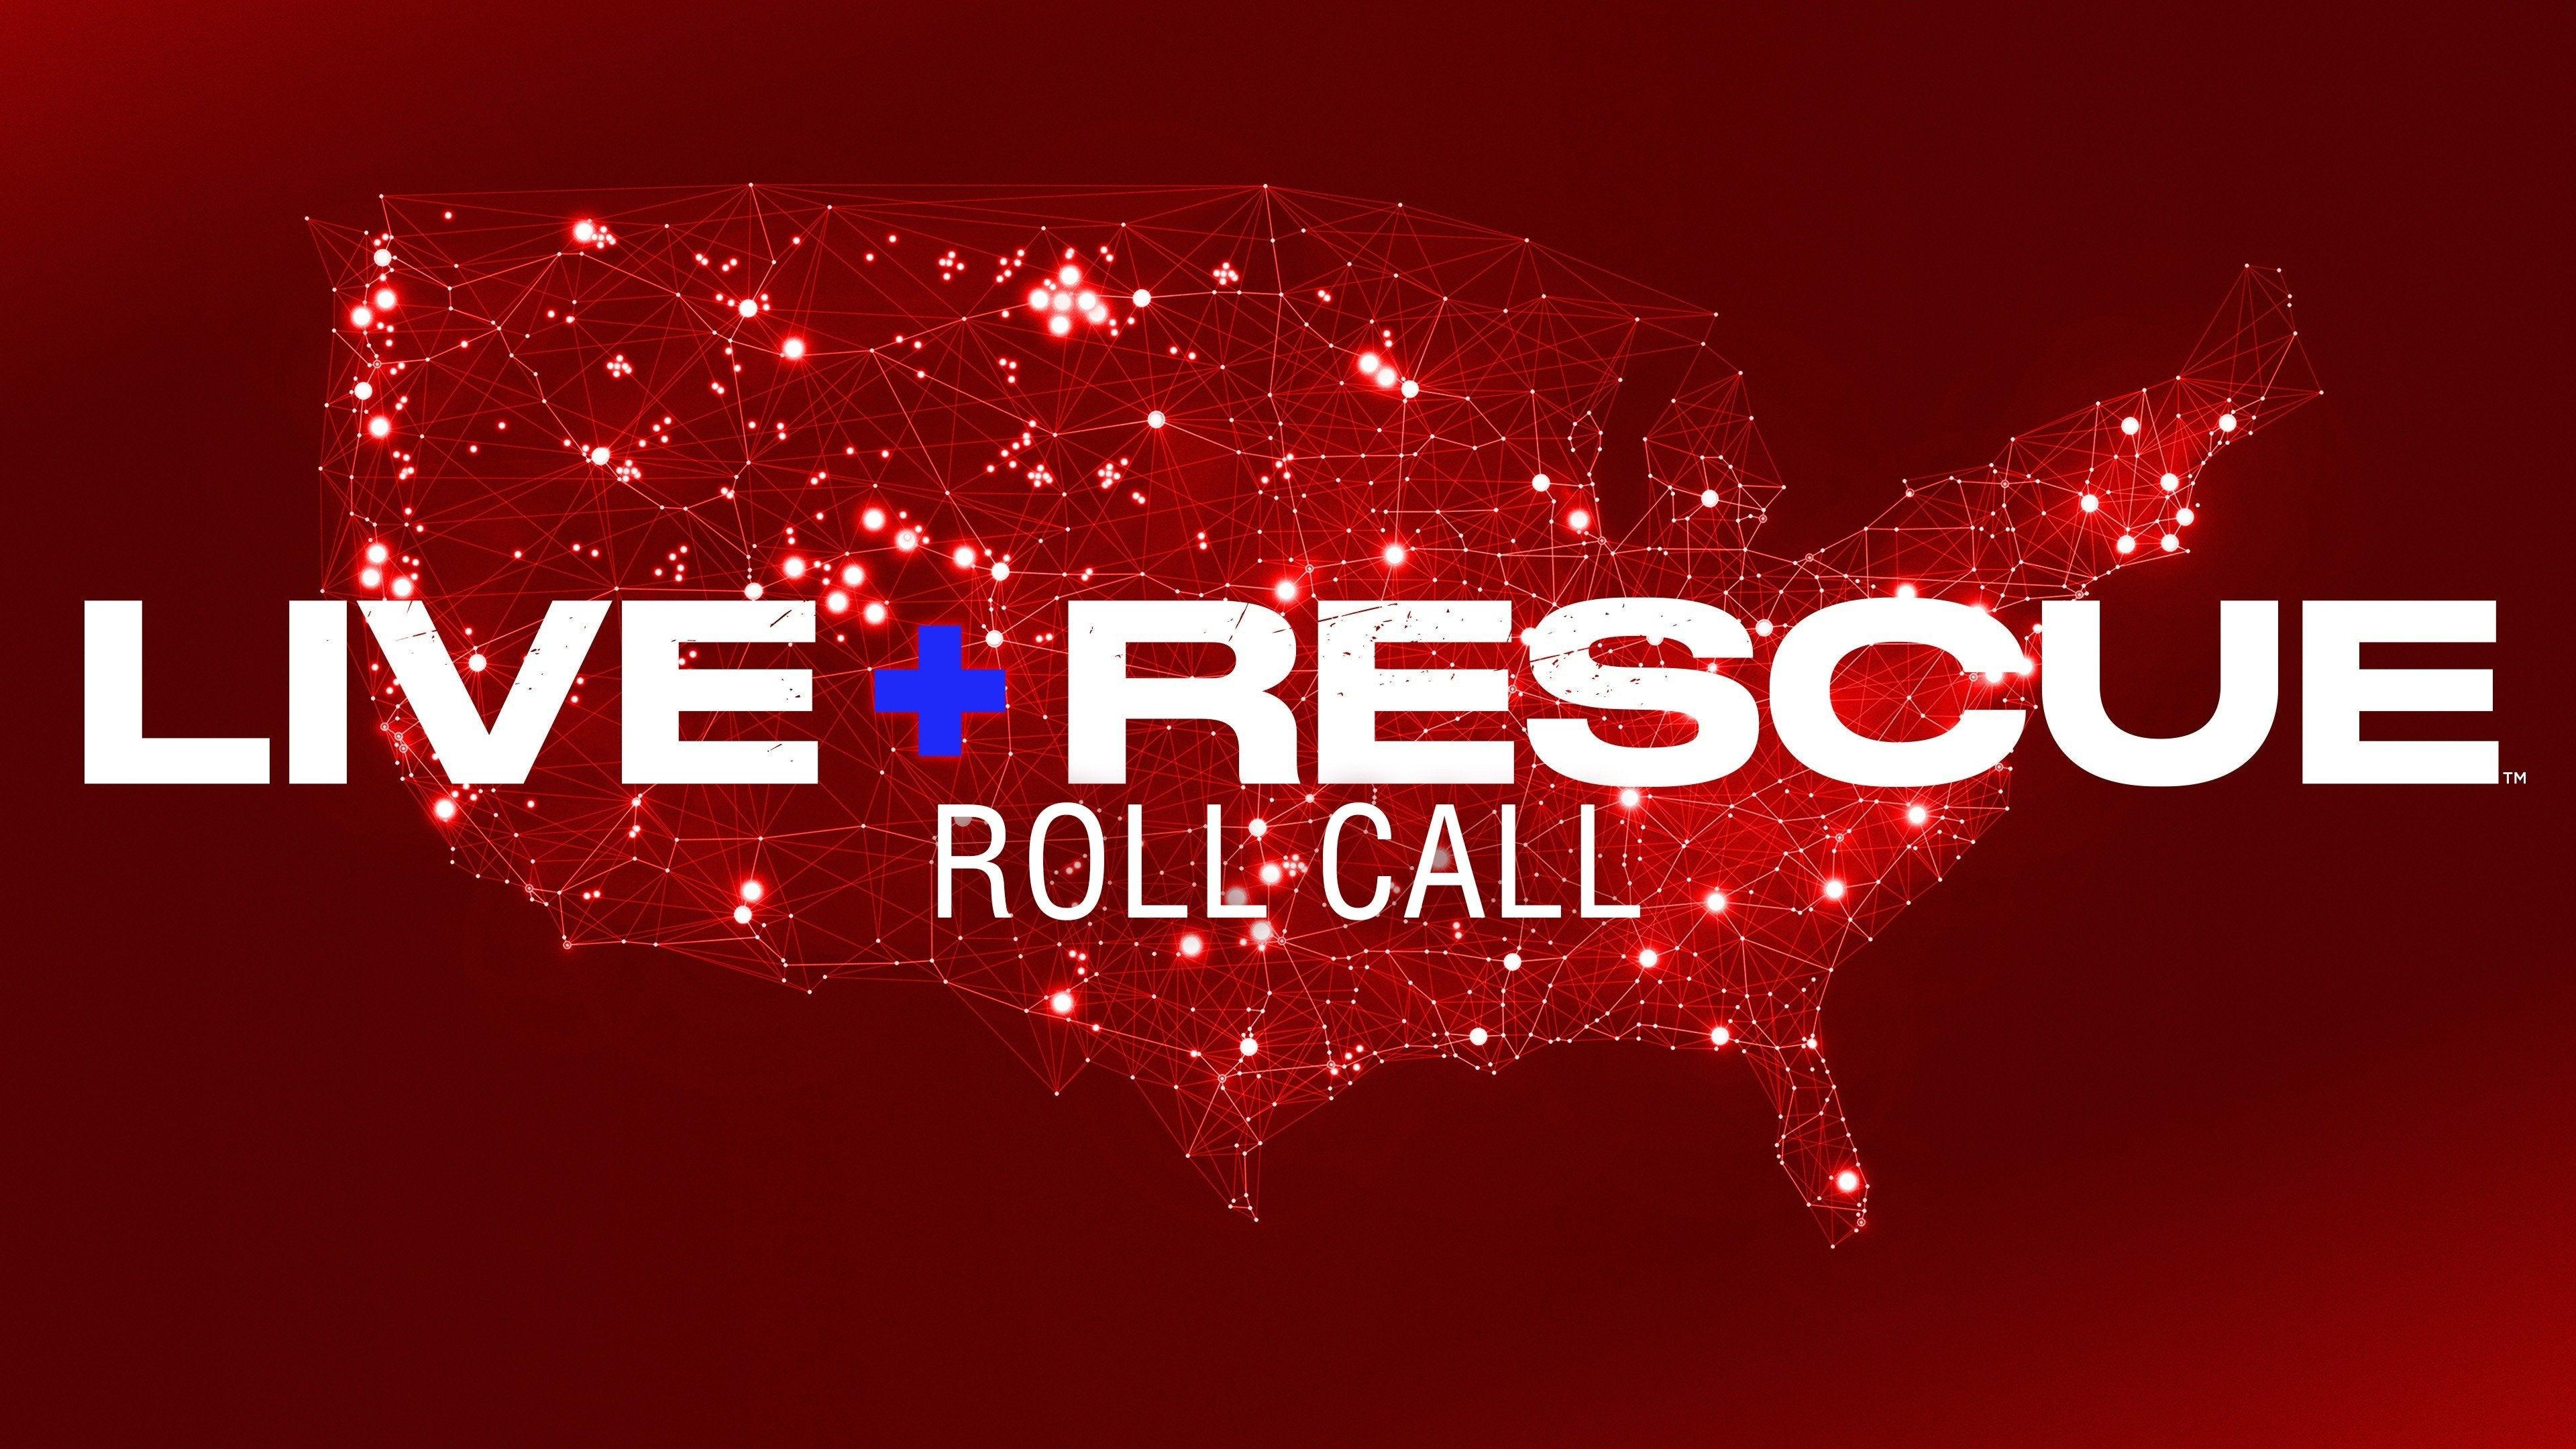 Live Rescue: Roll Call